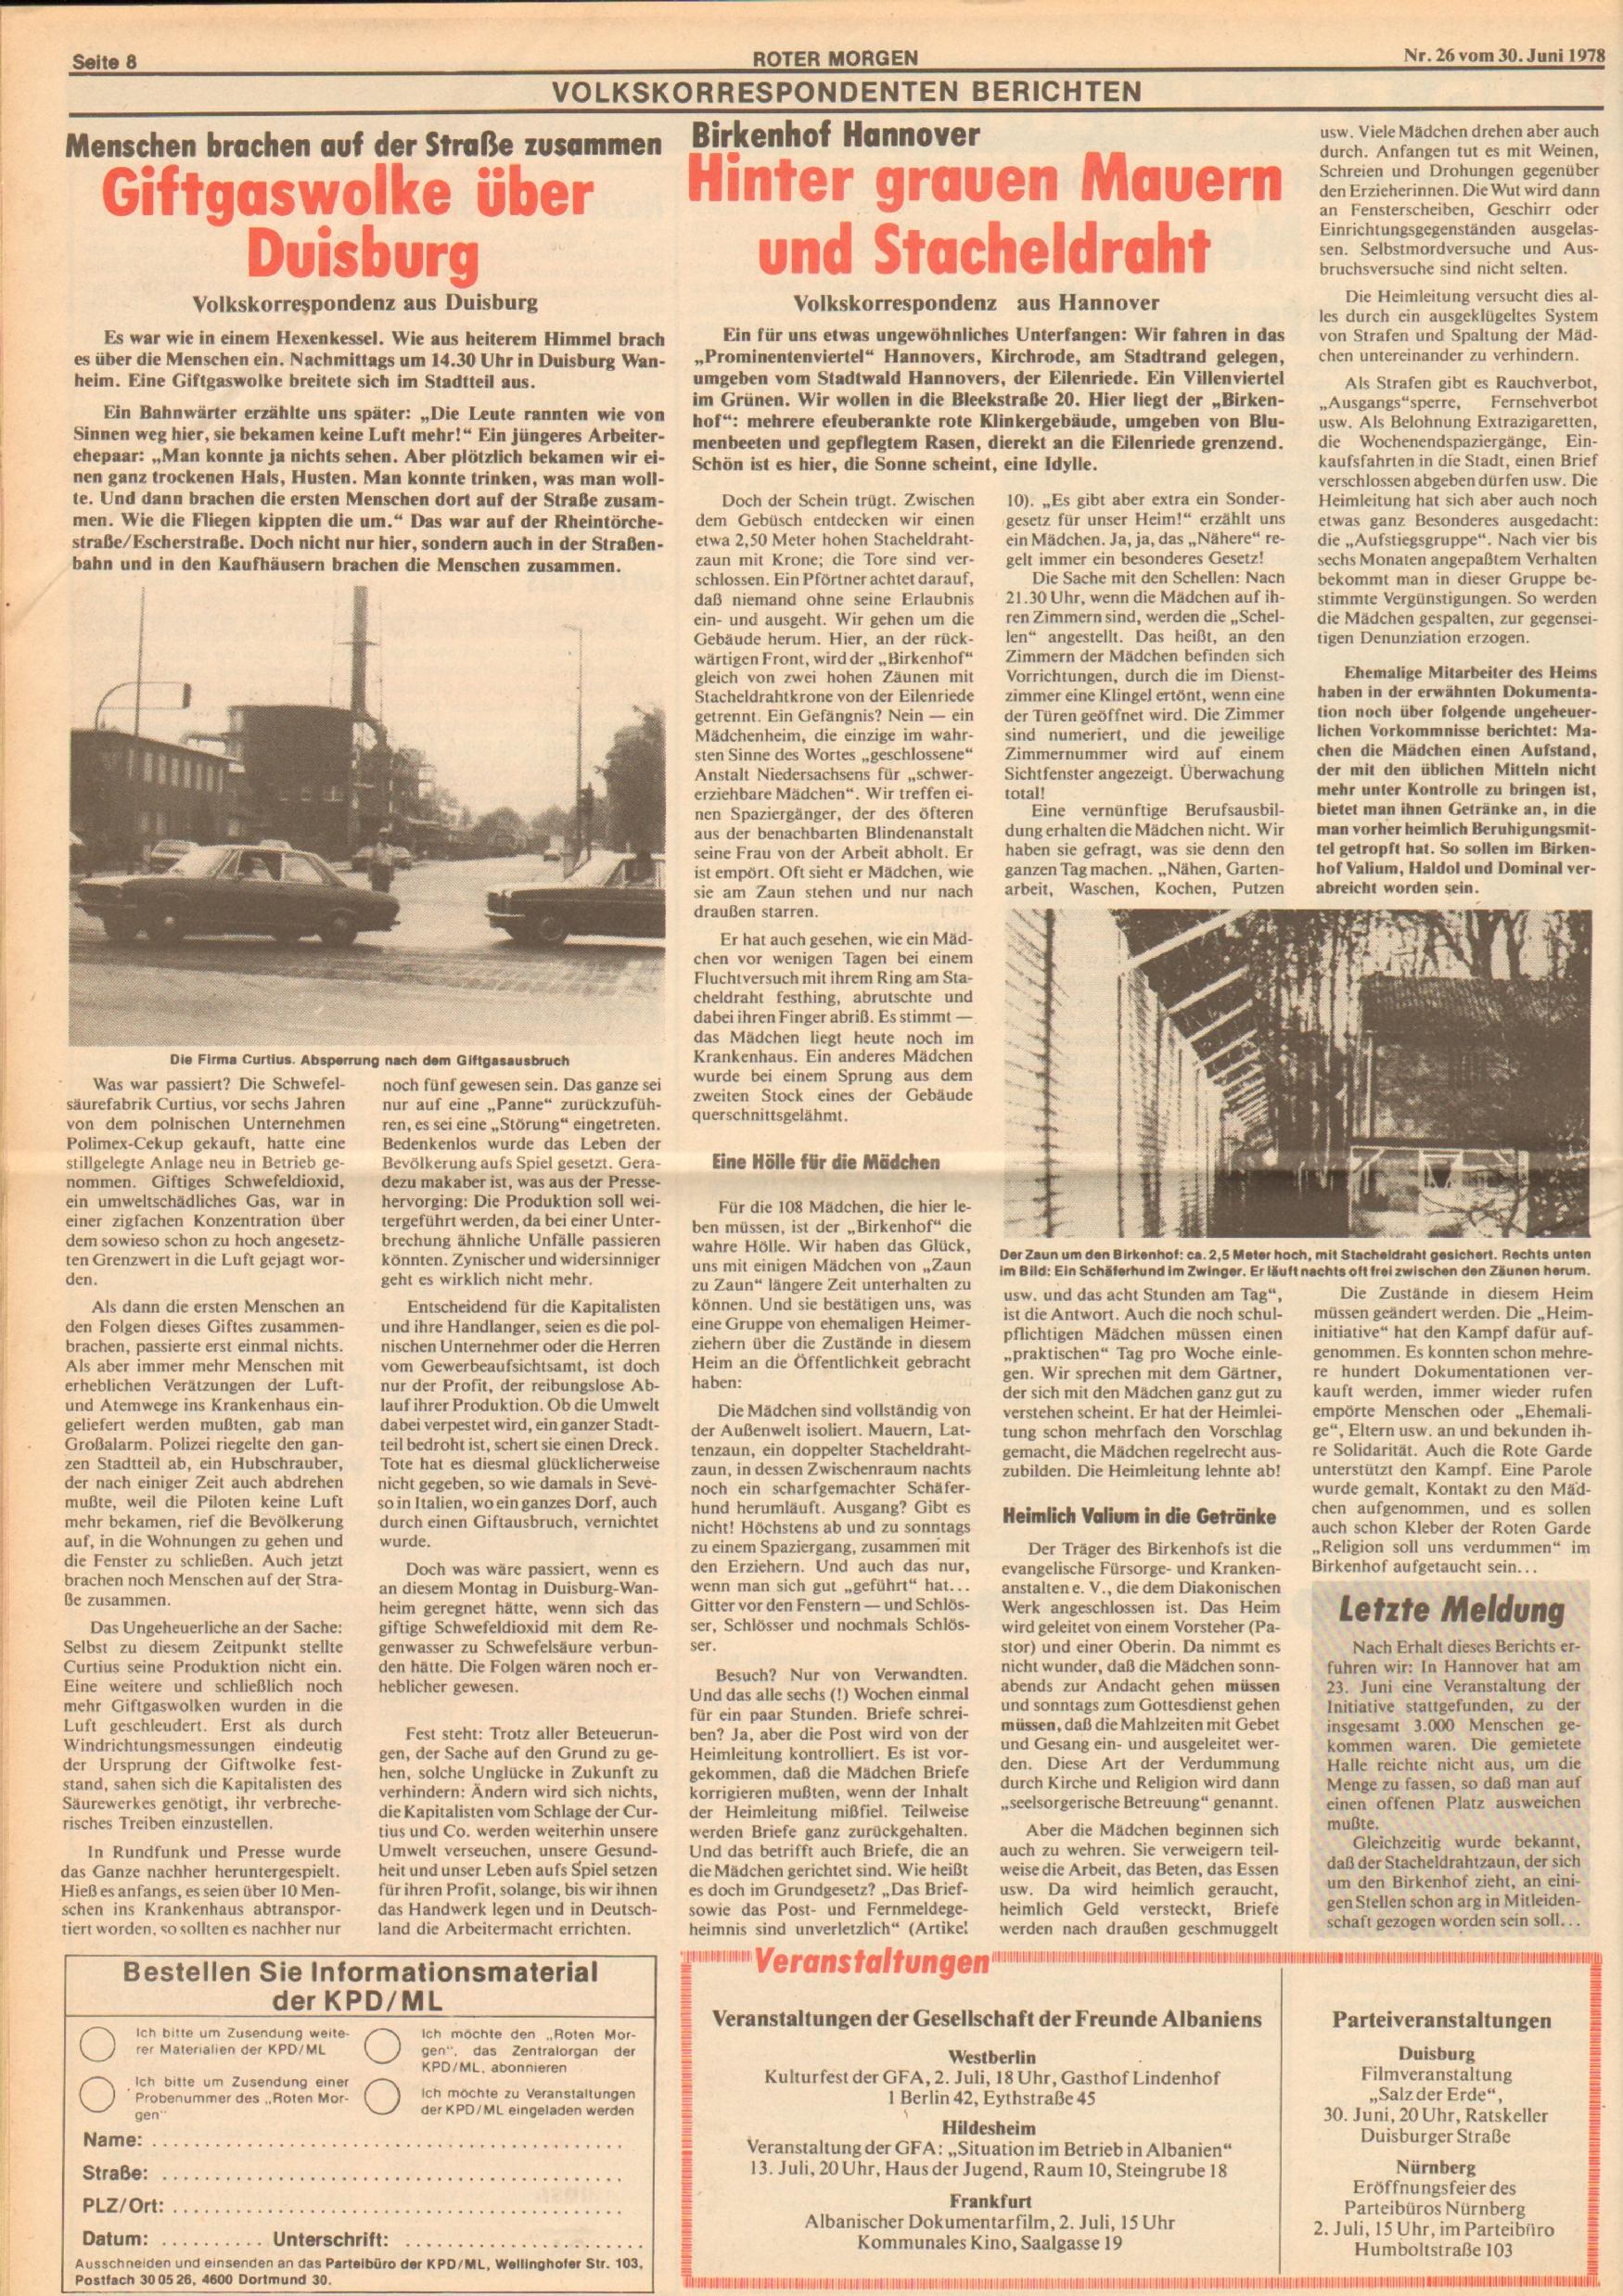 Roter Morgen, 12. Jg., 30. Juni 1978, Nr. 26, Seite 8